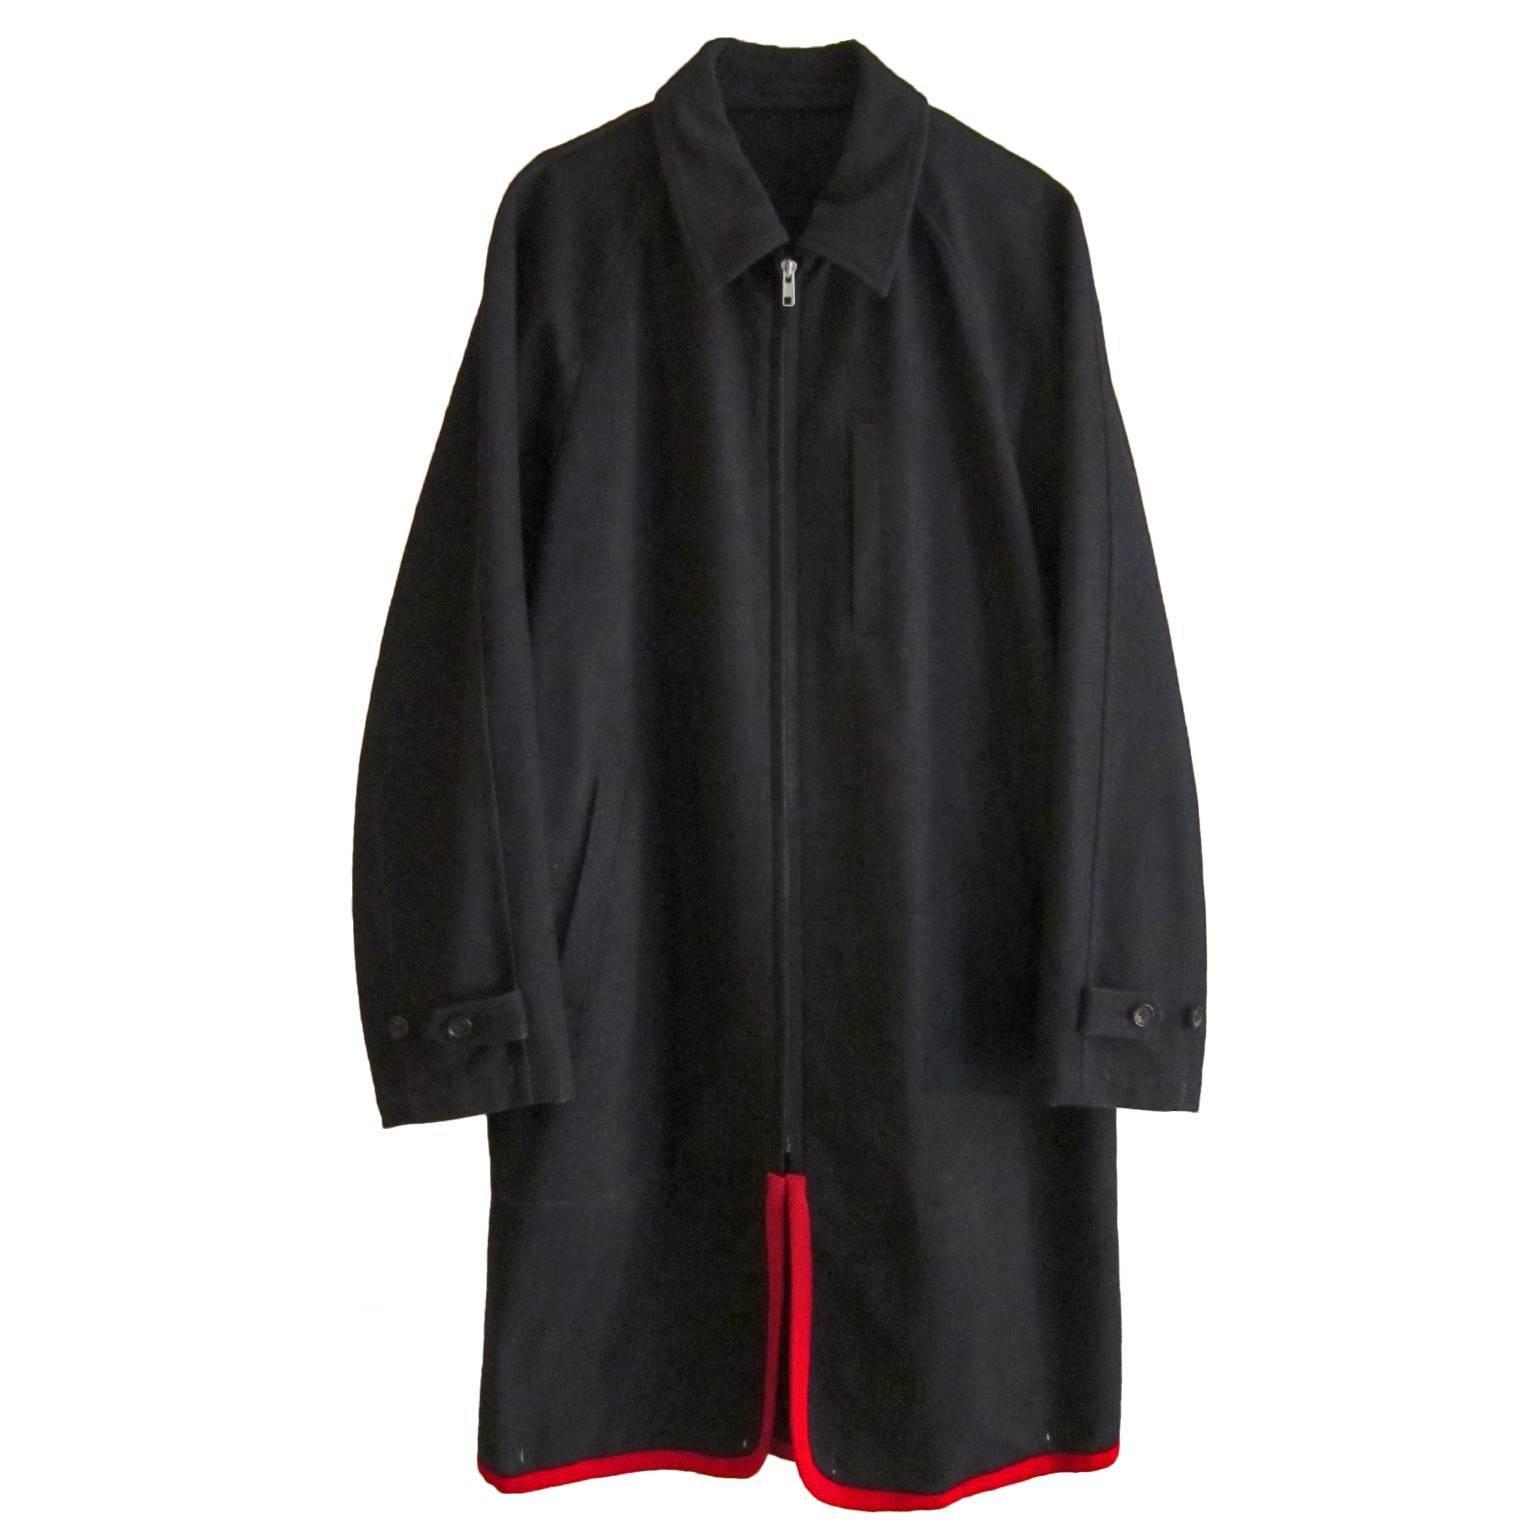 Comme des Garcons Charcoal Two Way Coat, 1999